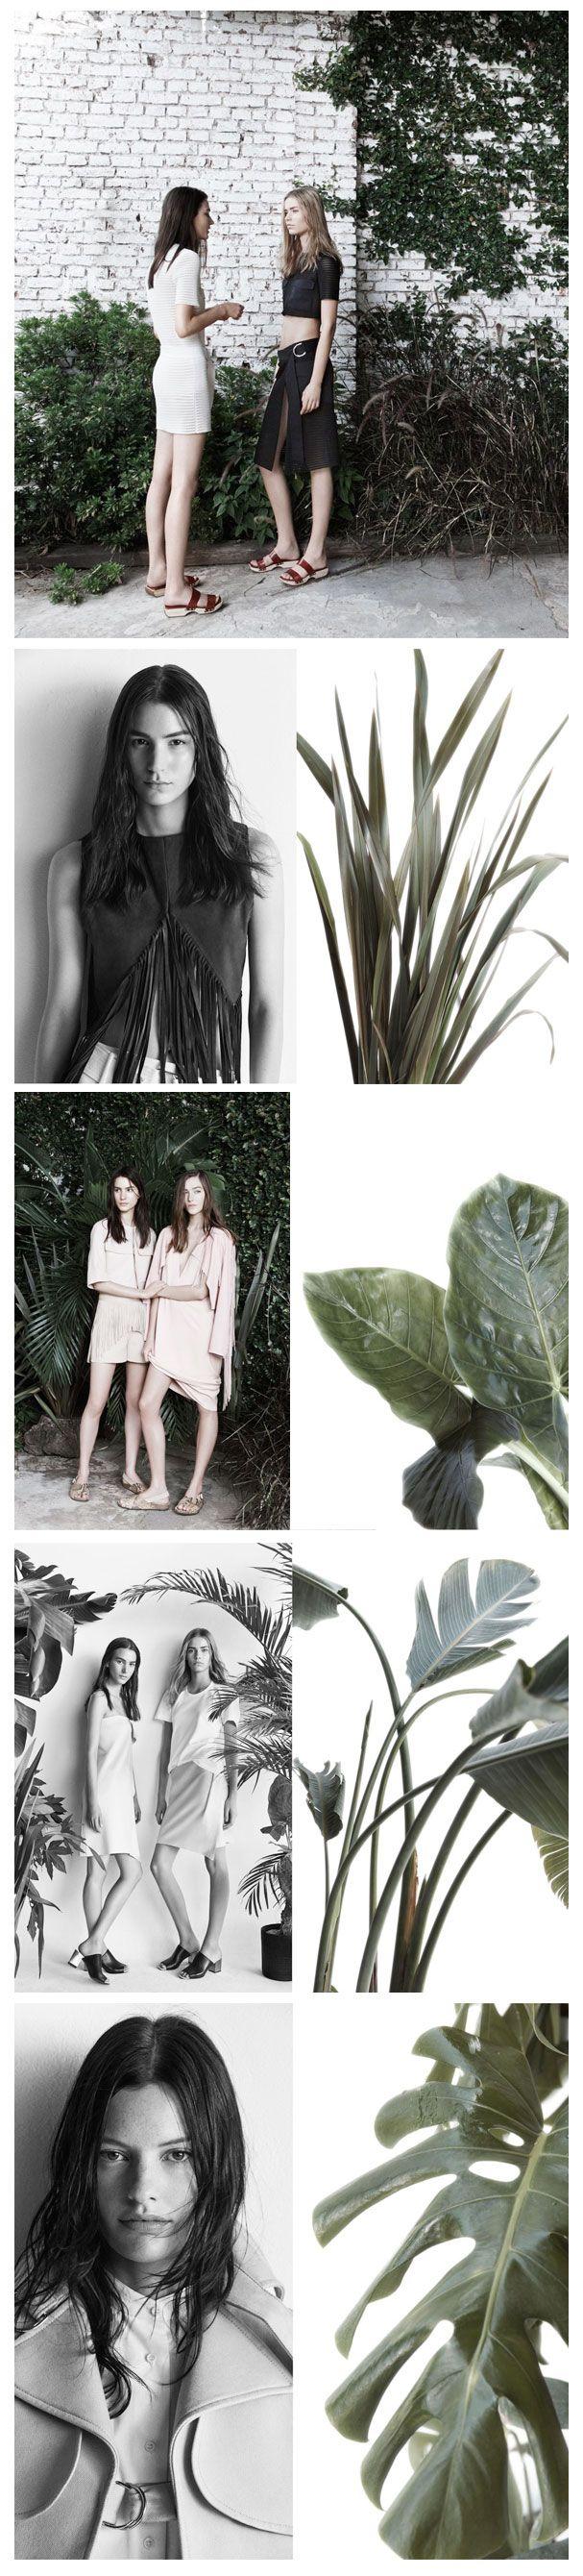 Zara Spring Summer 2014.  fashion, design, minimal, simplicity, minimalist, minimalism